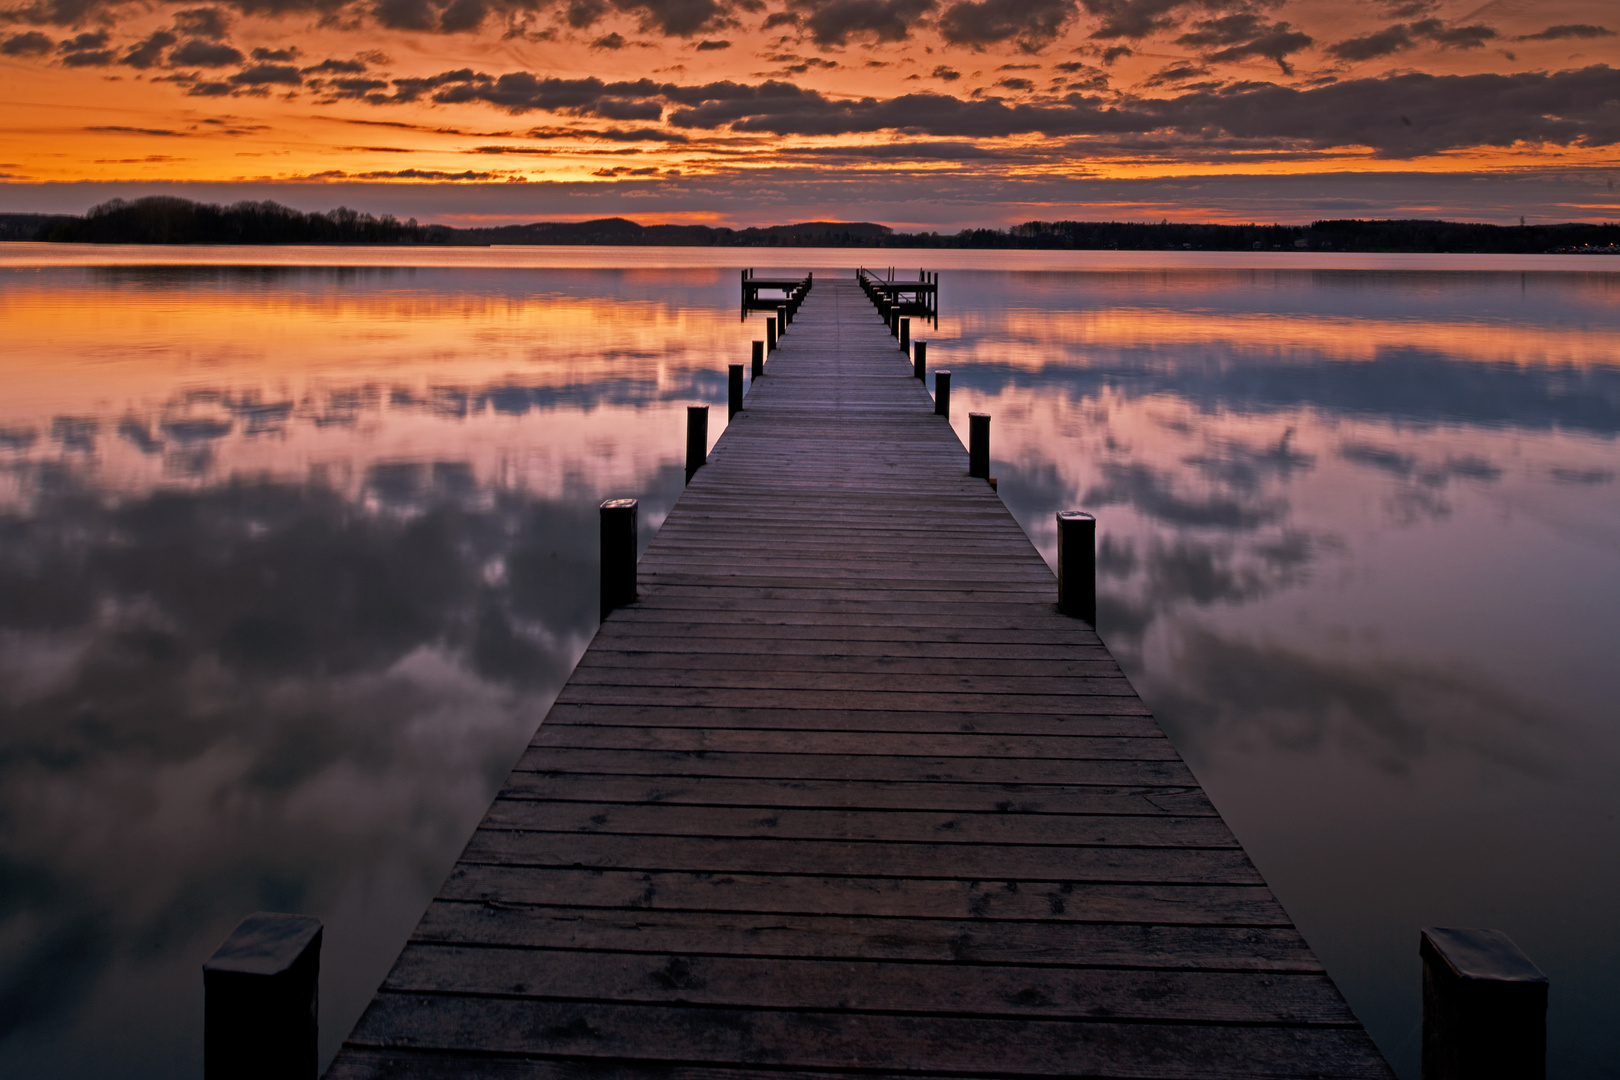 Sonnenaufgang beim Wörthsee